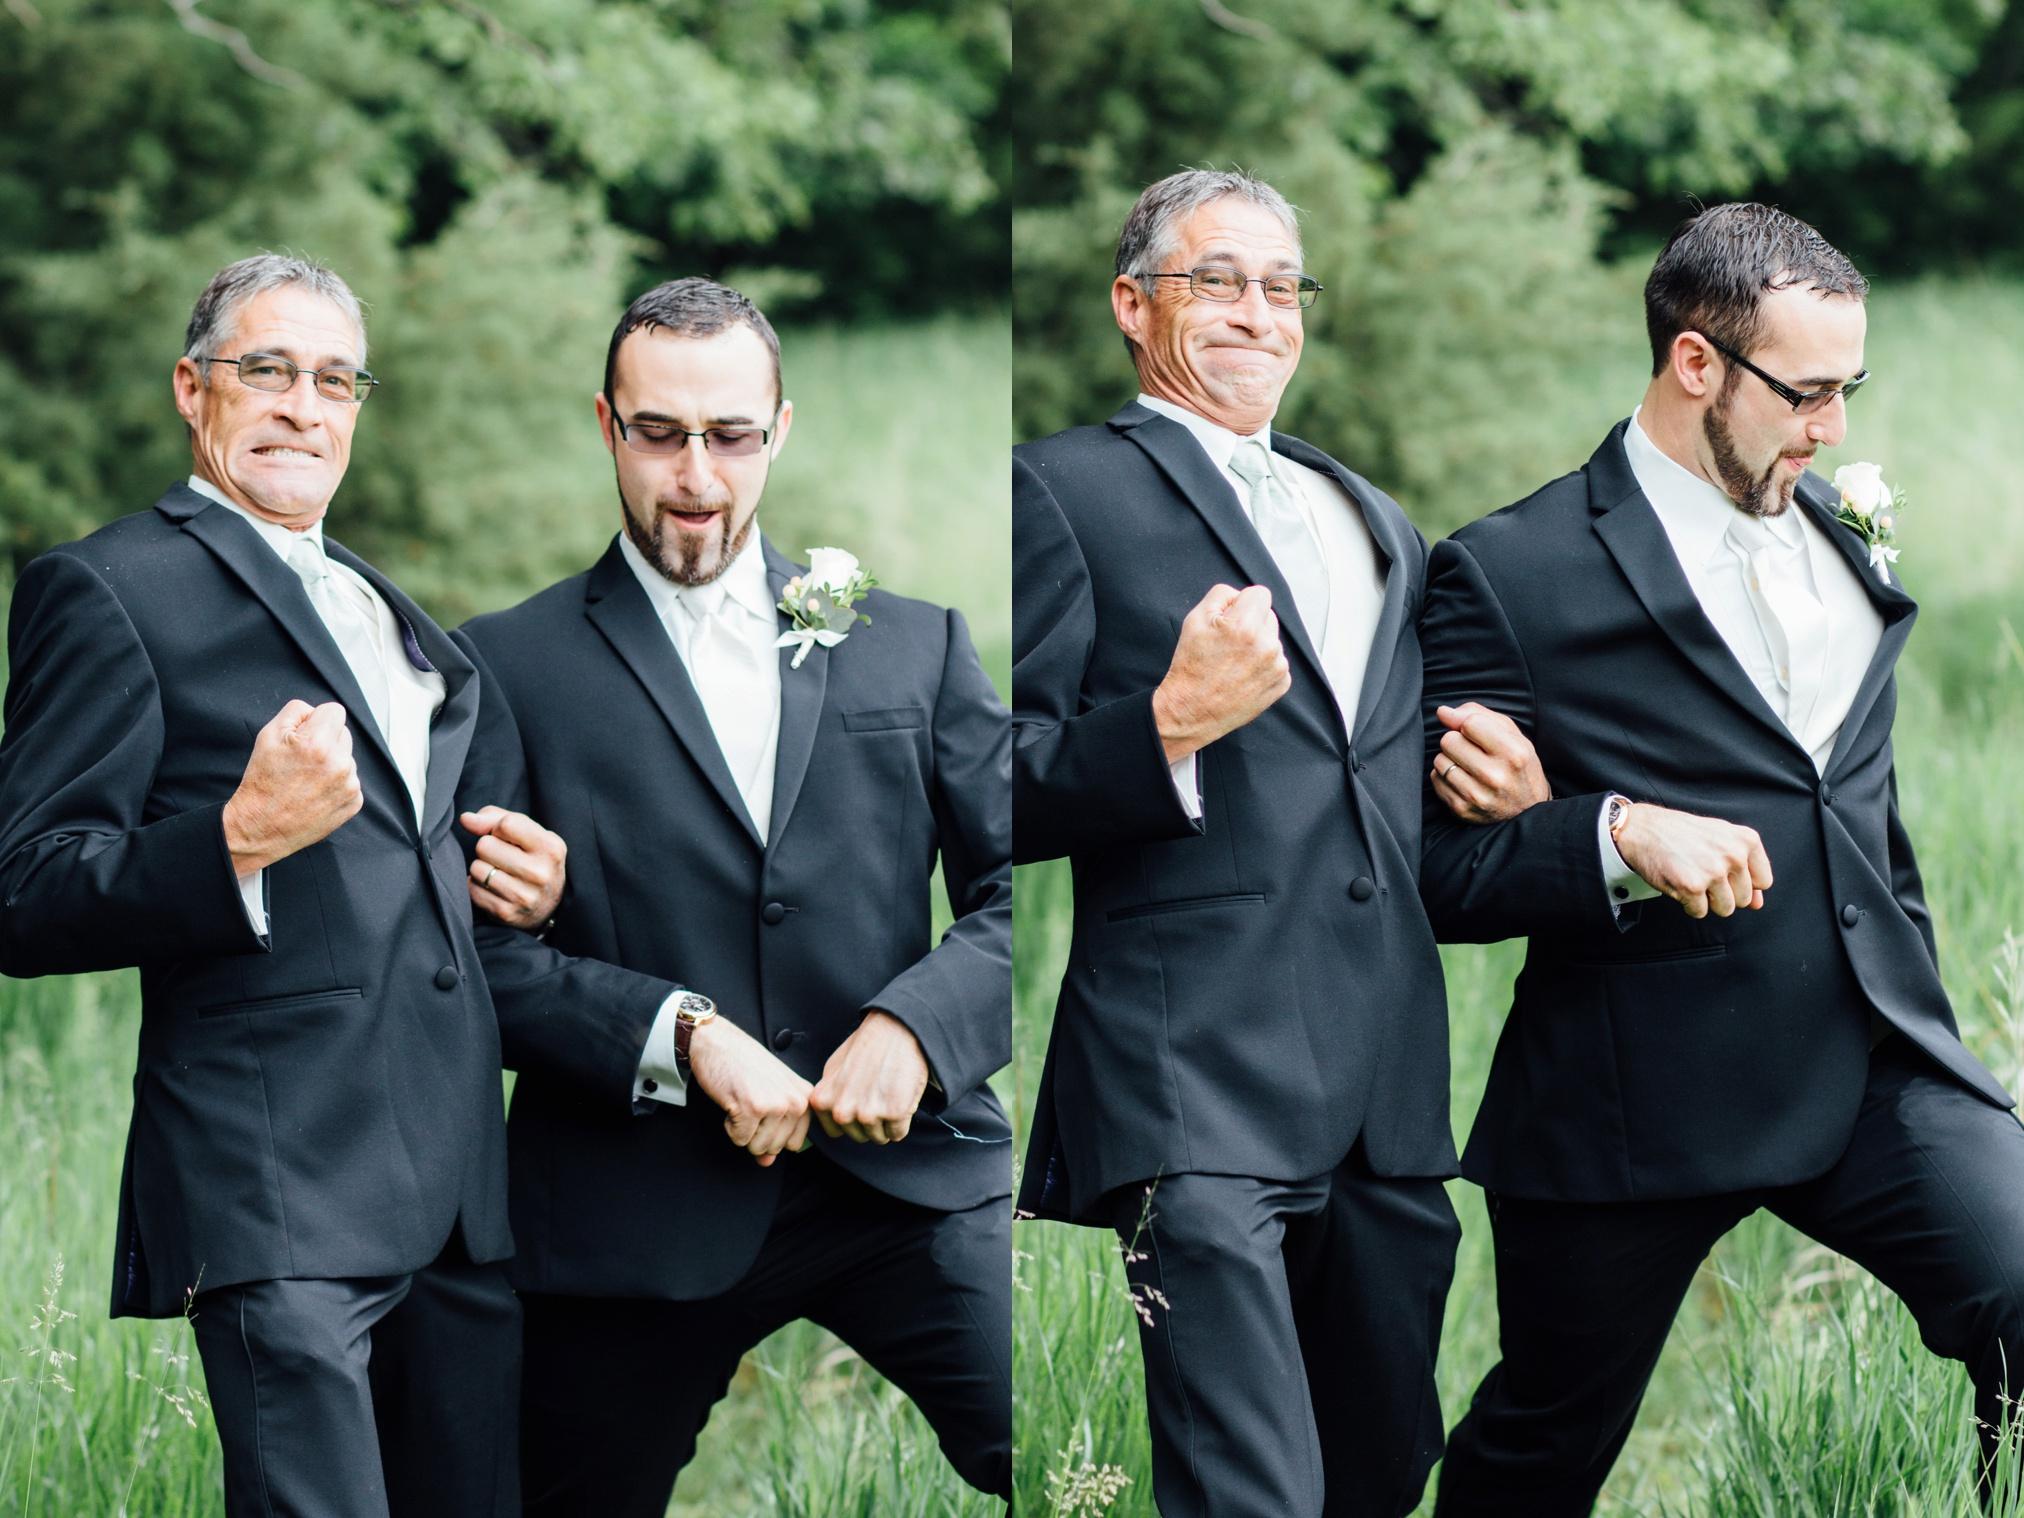 schmid_wedding-210.jpg